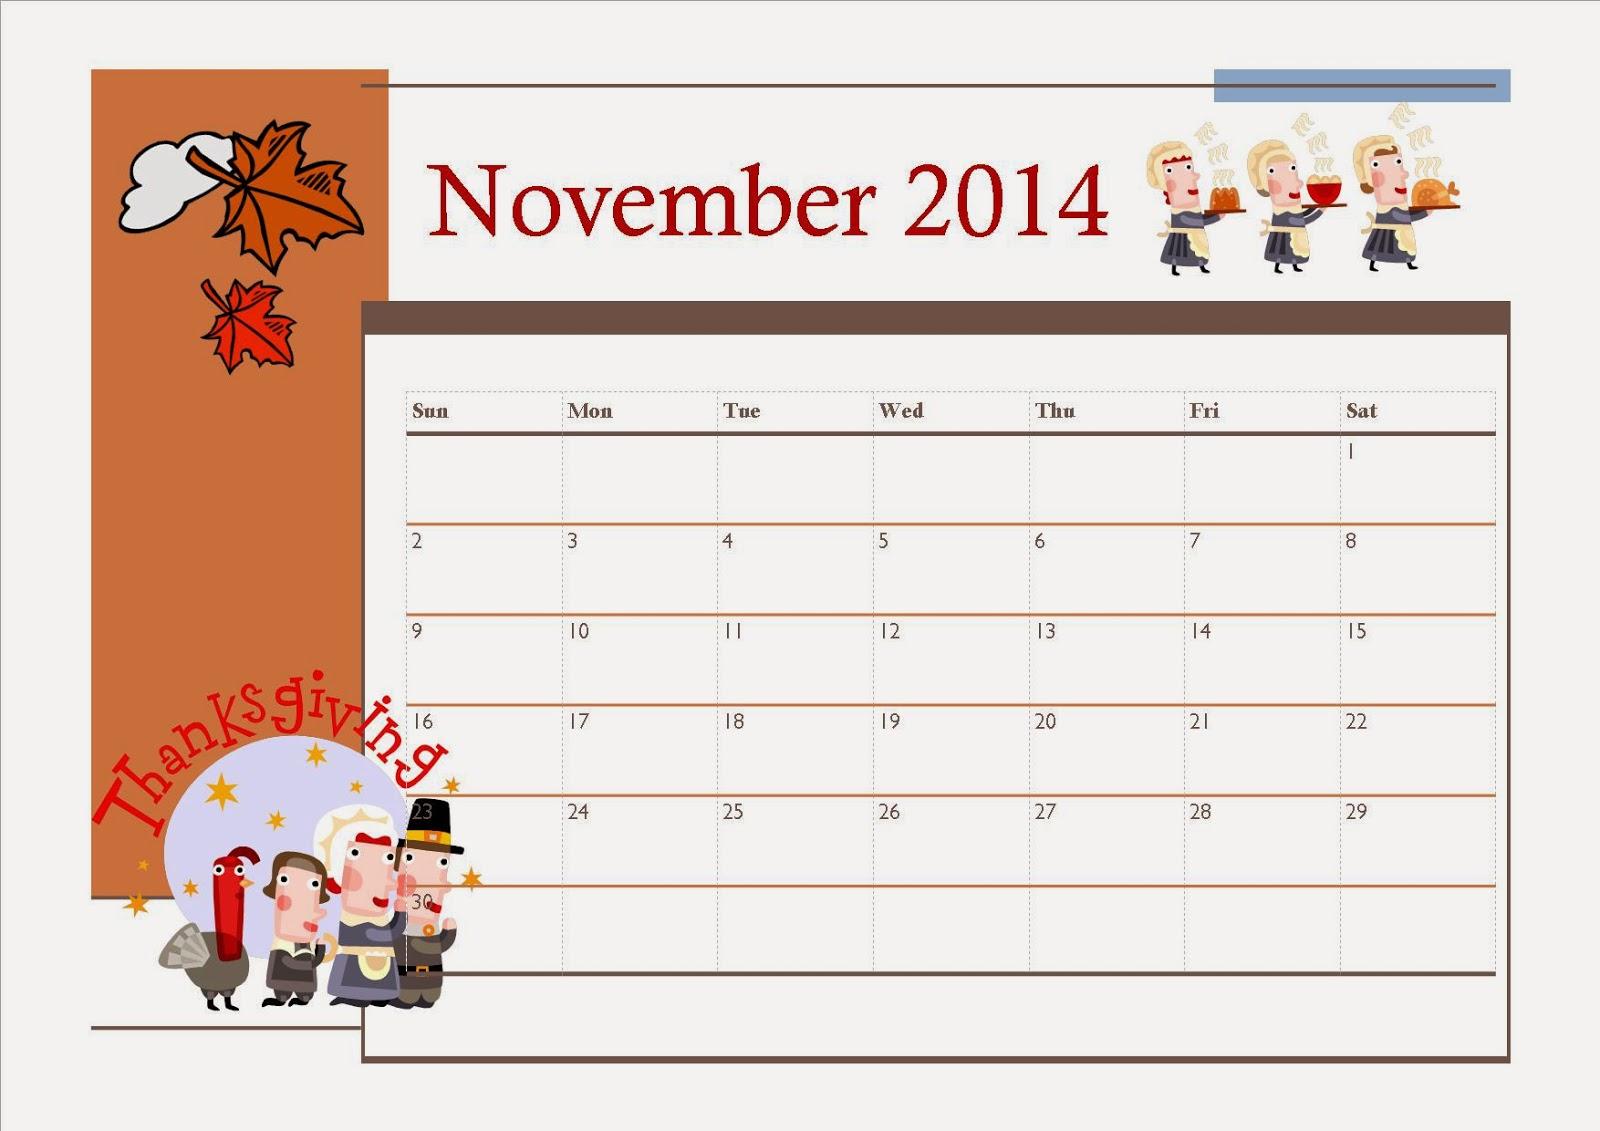 November Calendar 2014 Printable : October parenting times